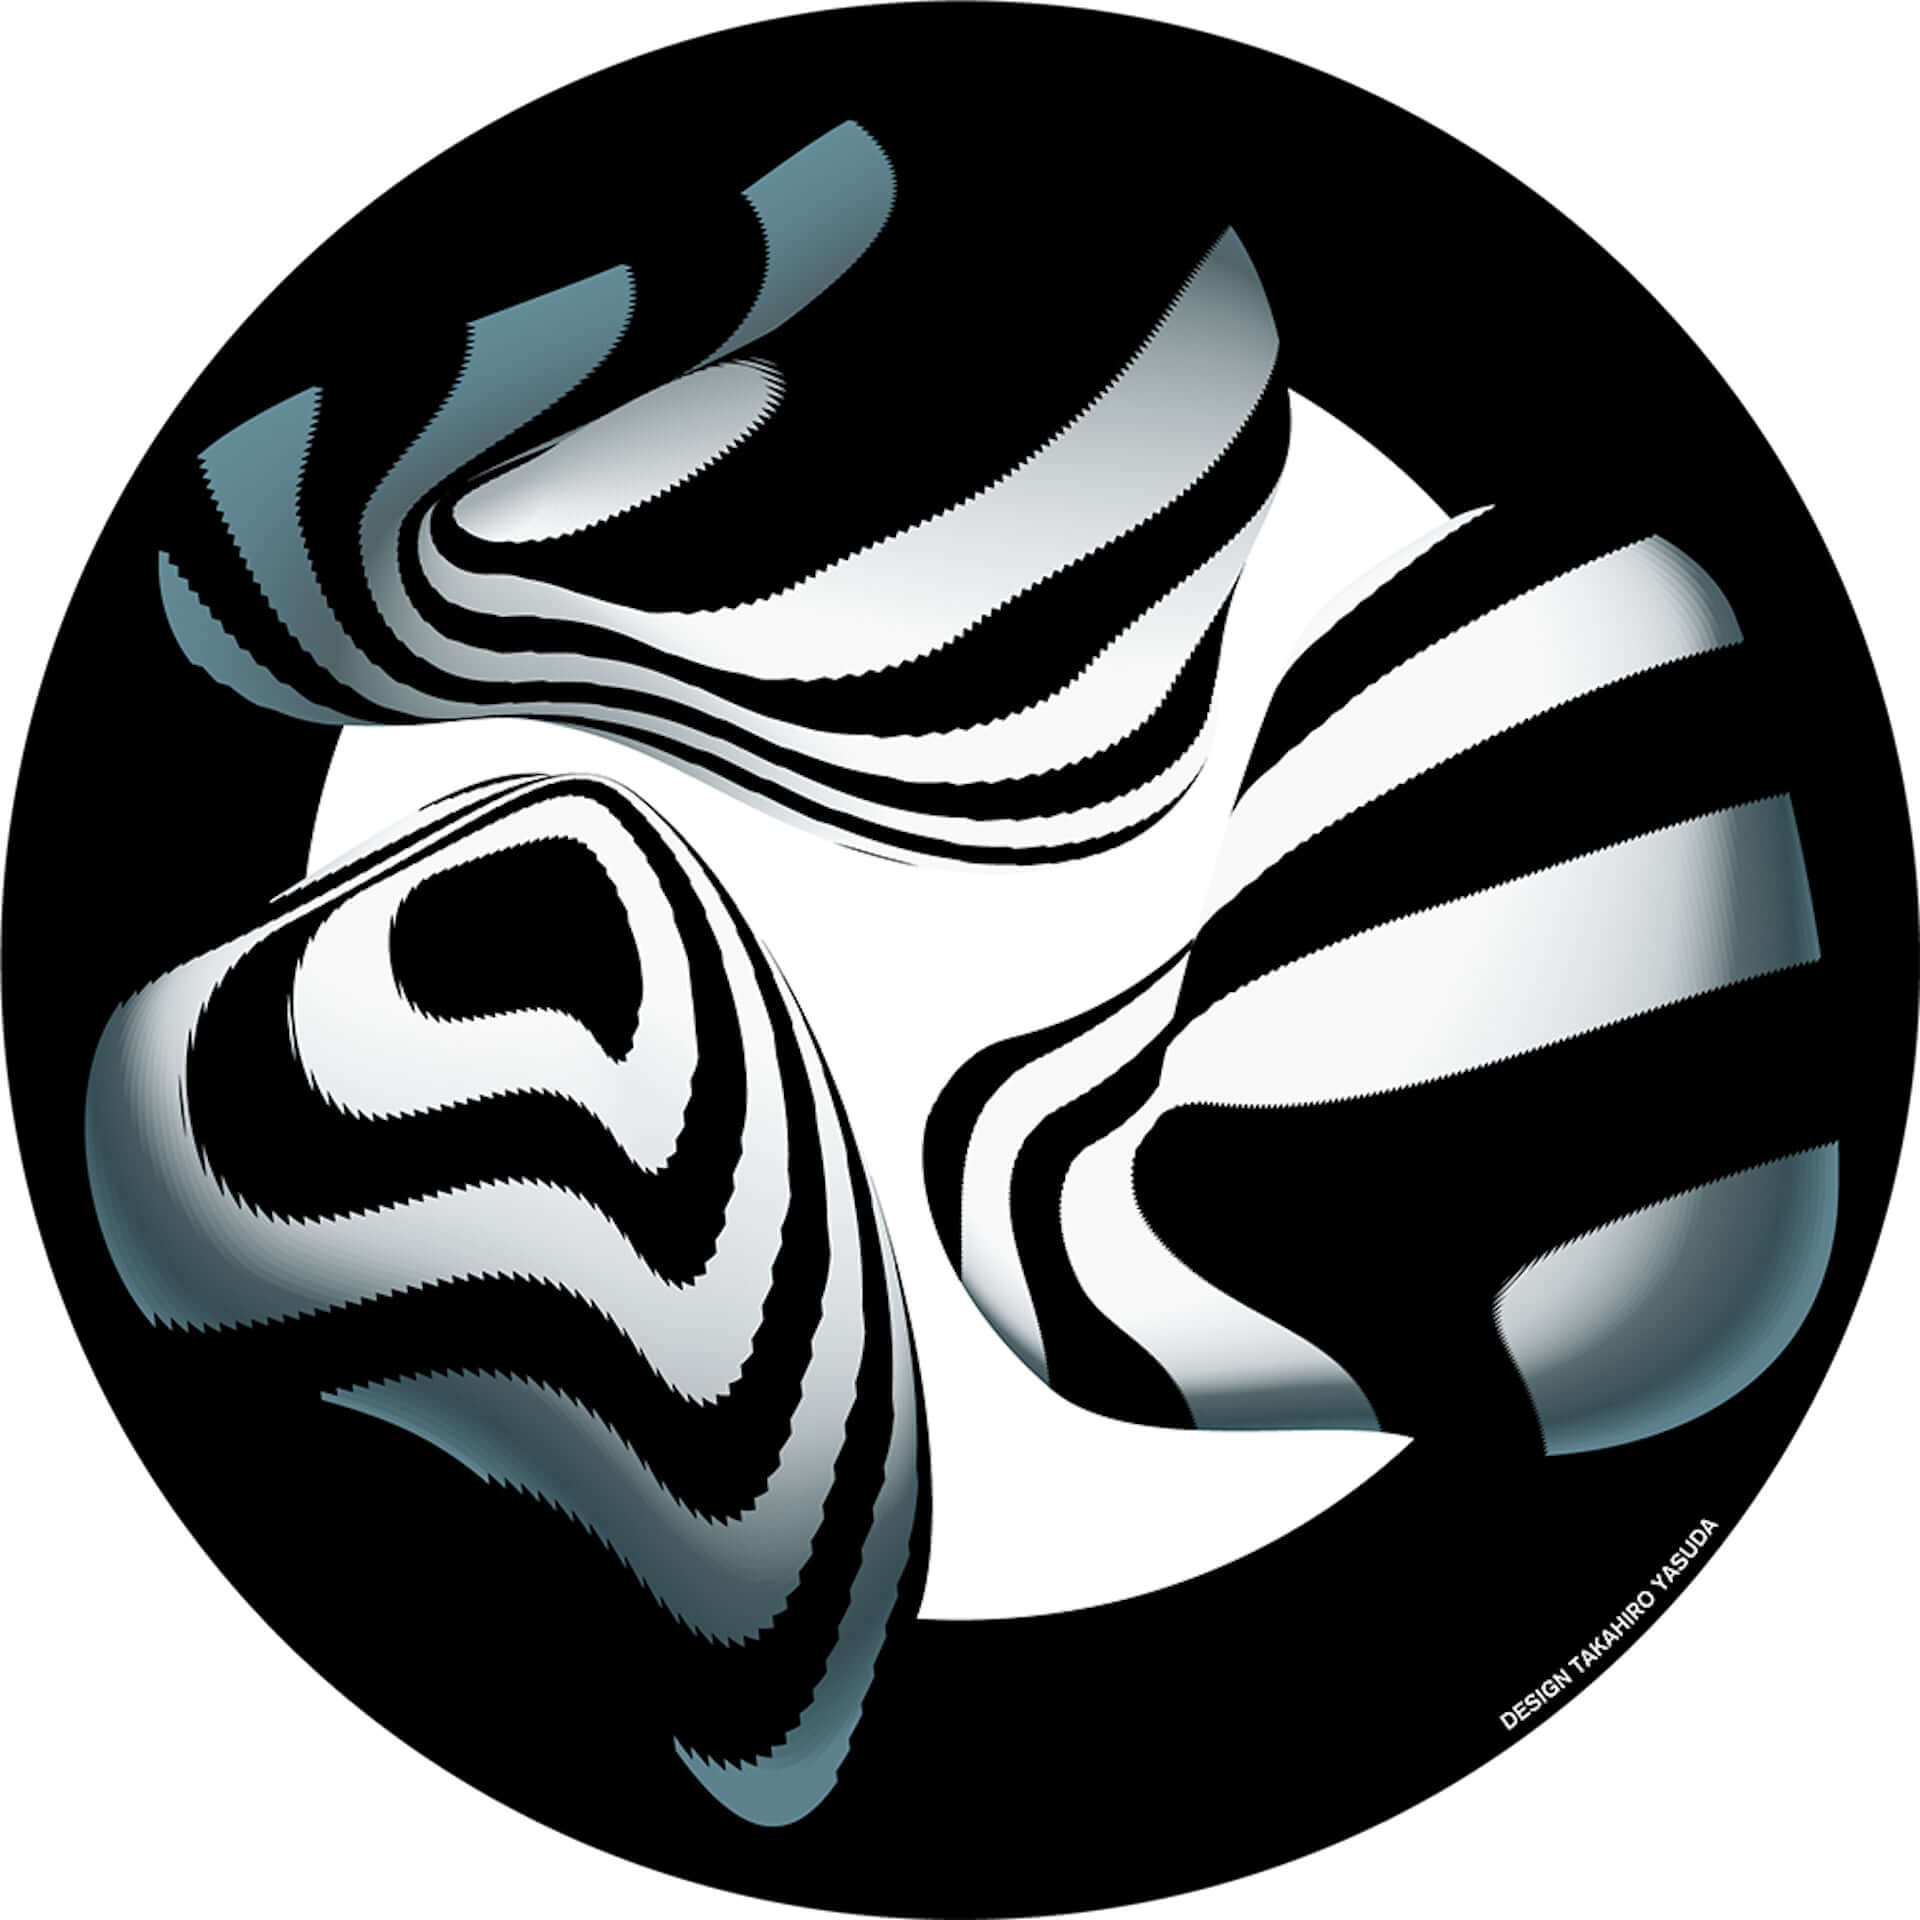 CEKAIの24時間DJ配信局『FM SON』に長場雄、安田昂弘、Masayoshi Iimori、OWNCEANらが新たに参加! musci200522_cekai_fmson_7-1920x1920